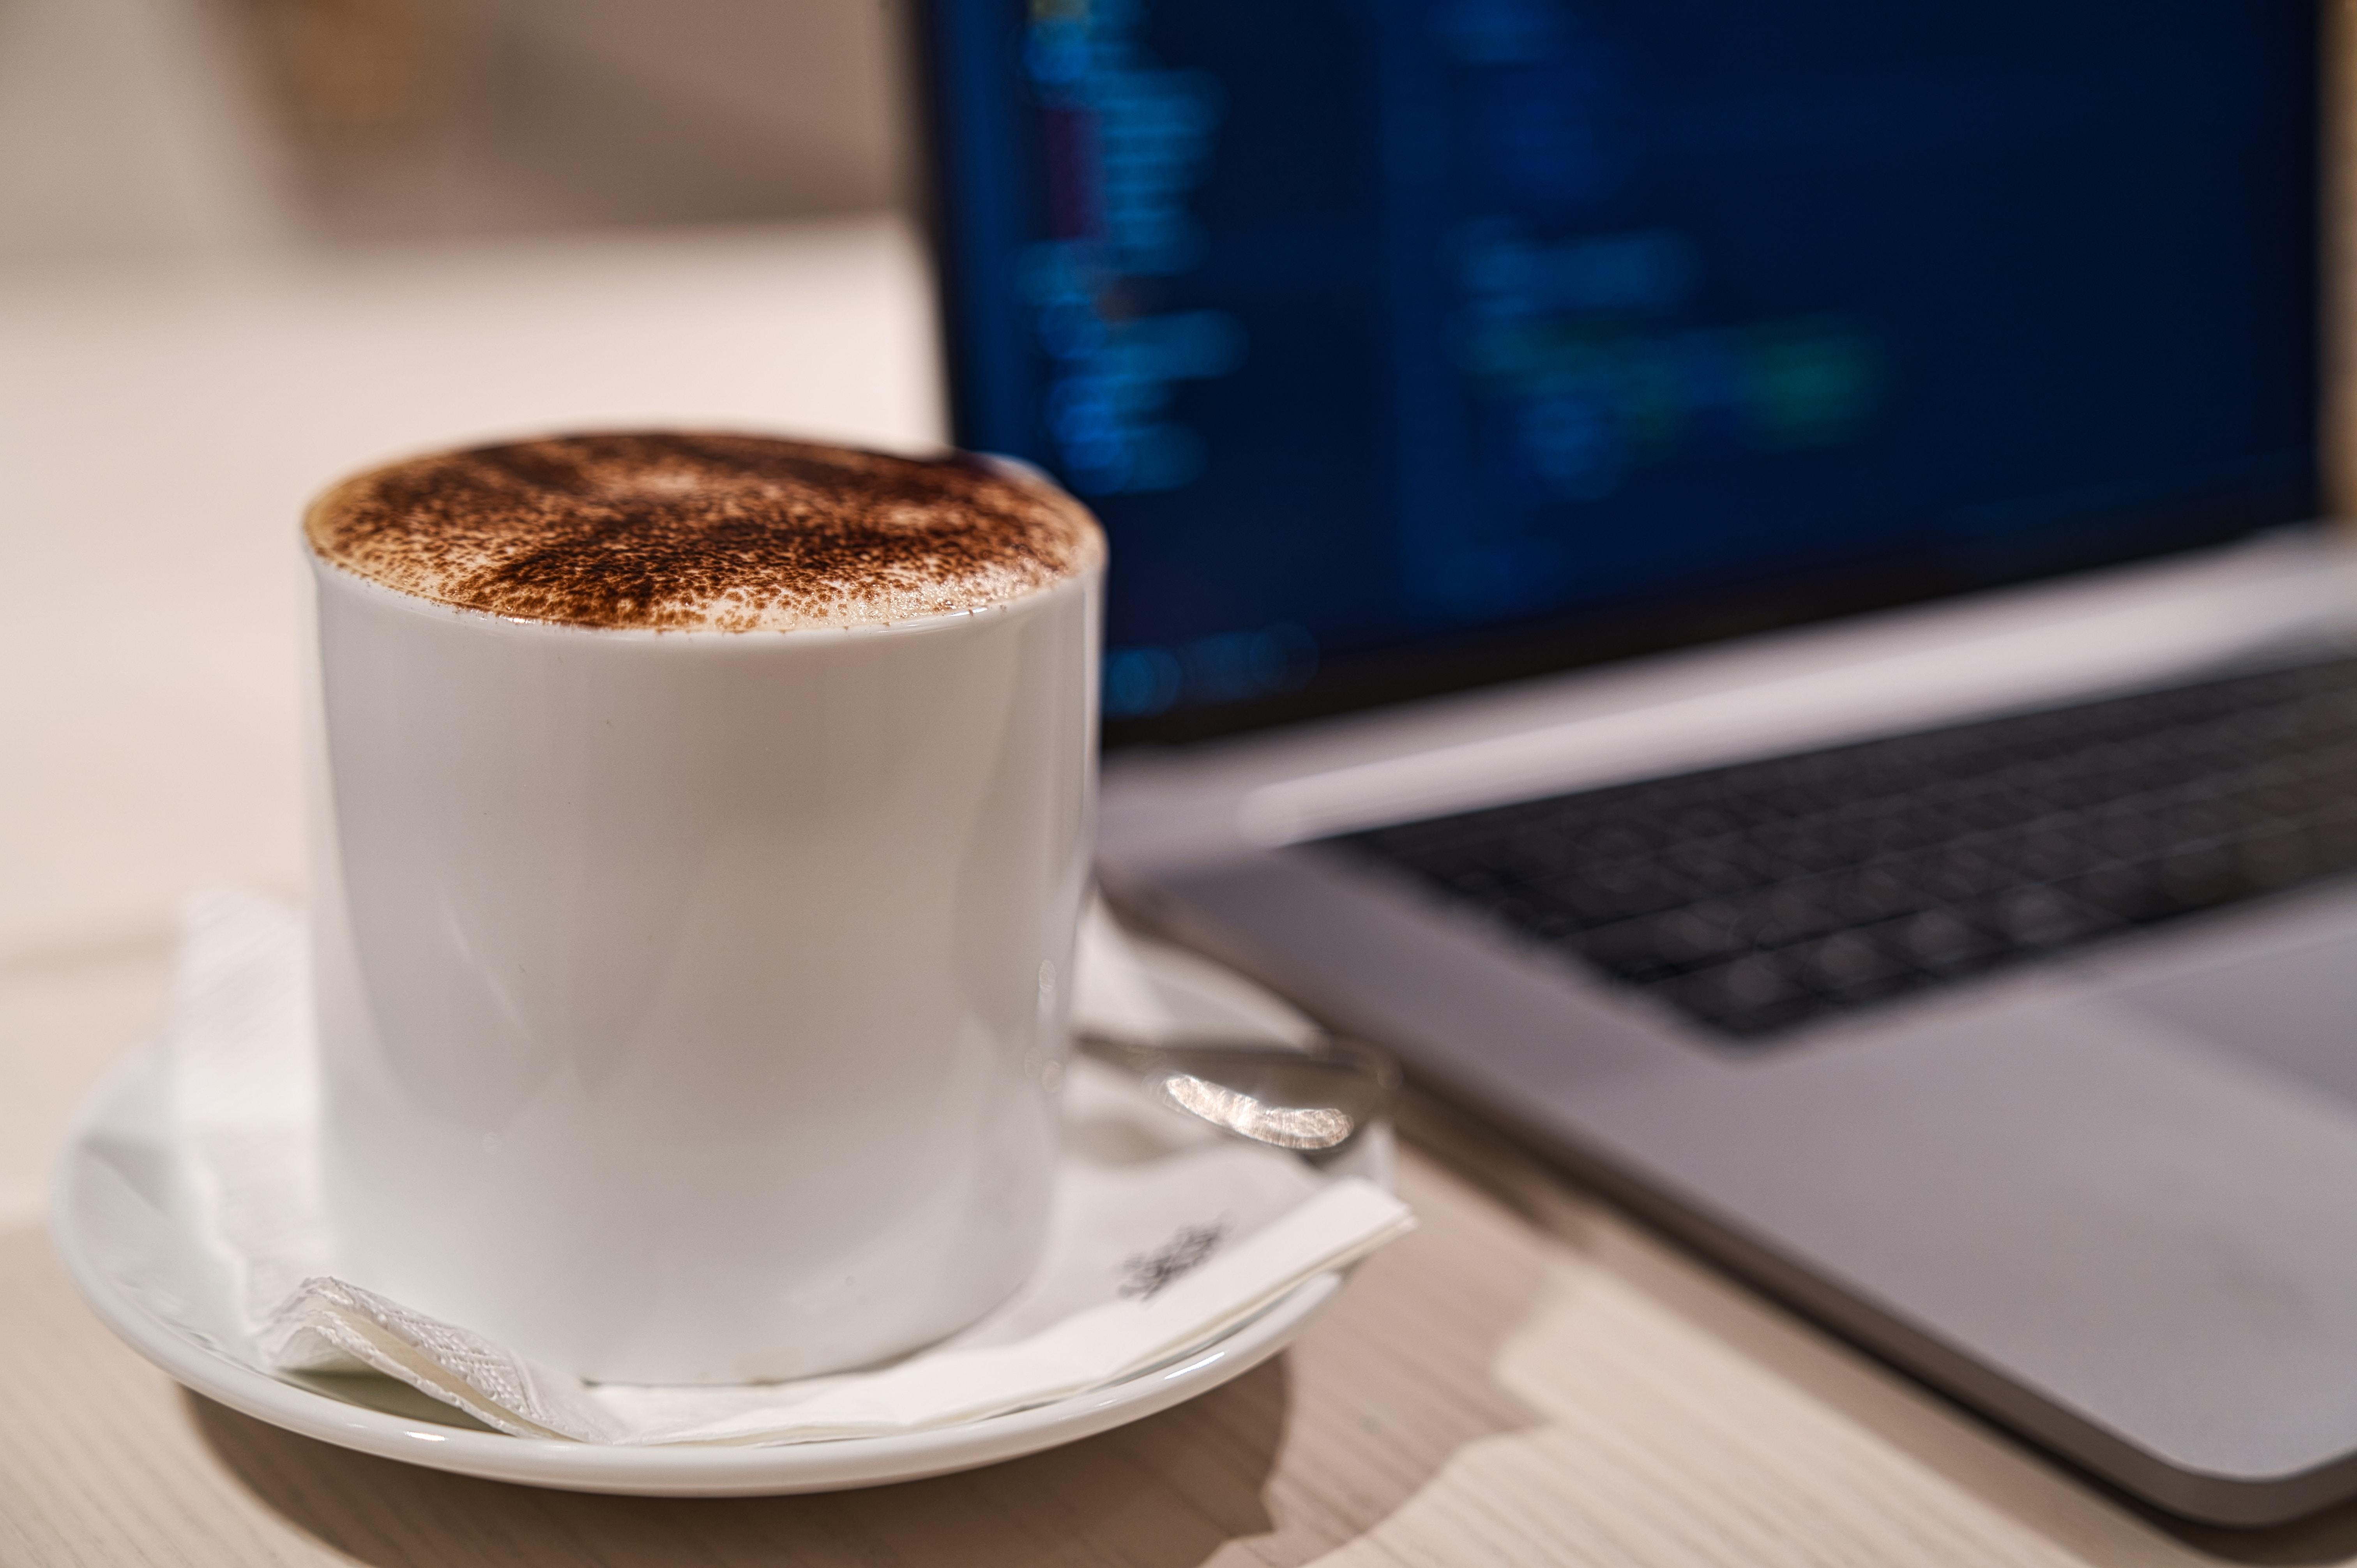 CoffeePerks